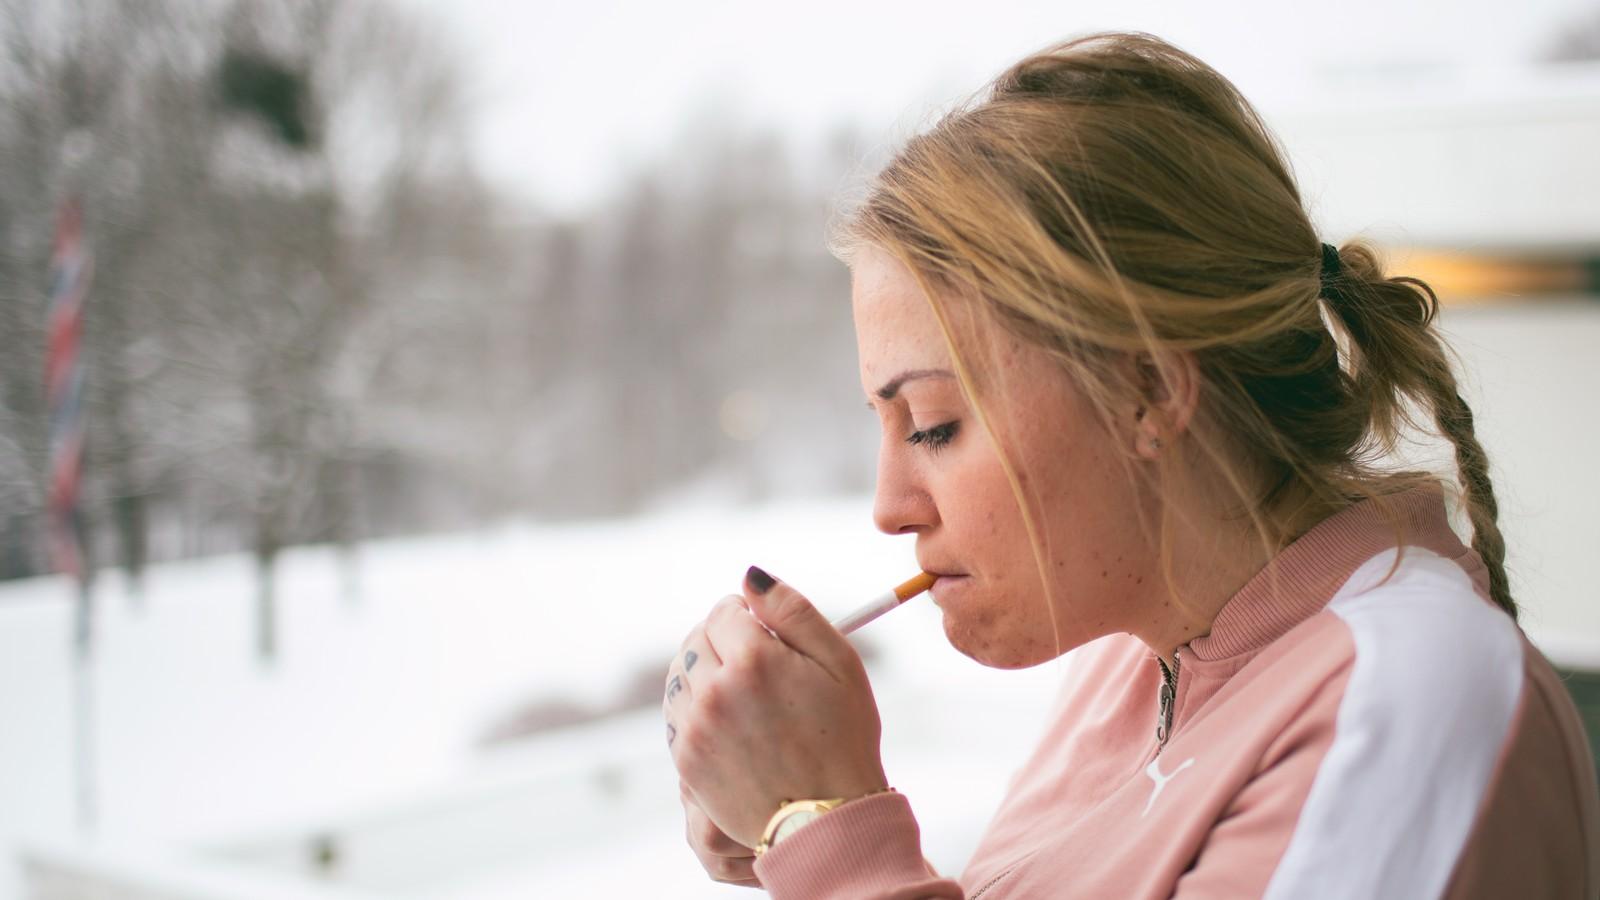 Amelia tenner en røyk i luftegården ved Bredtveit kvinnefengsel.